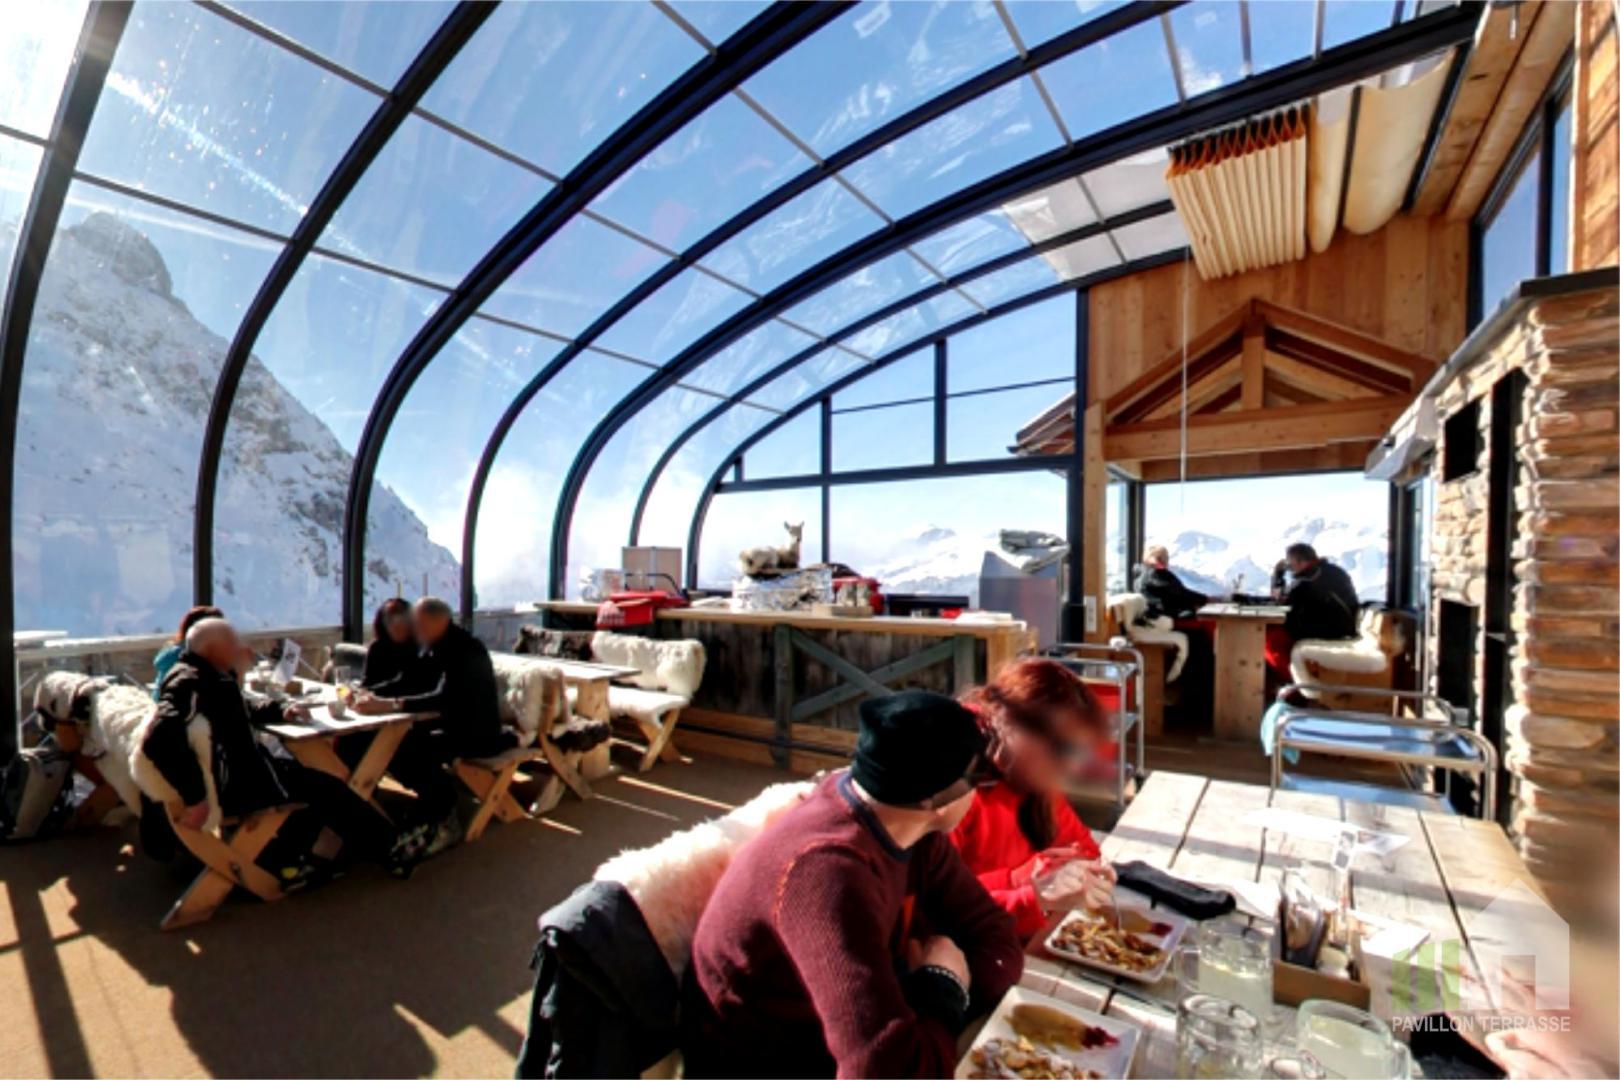 Abris Verandas Restaurant I Constructions Mobiles Pour Les